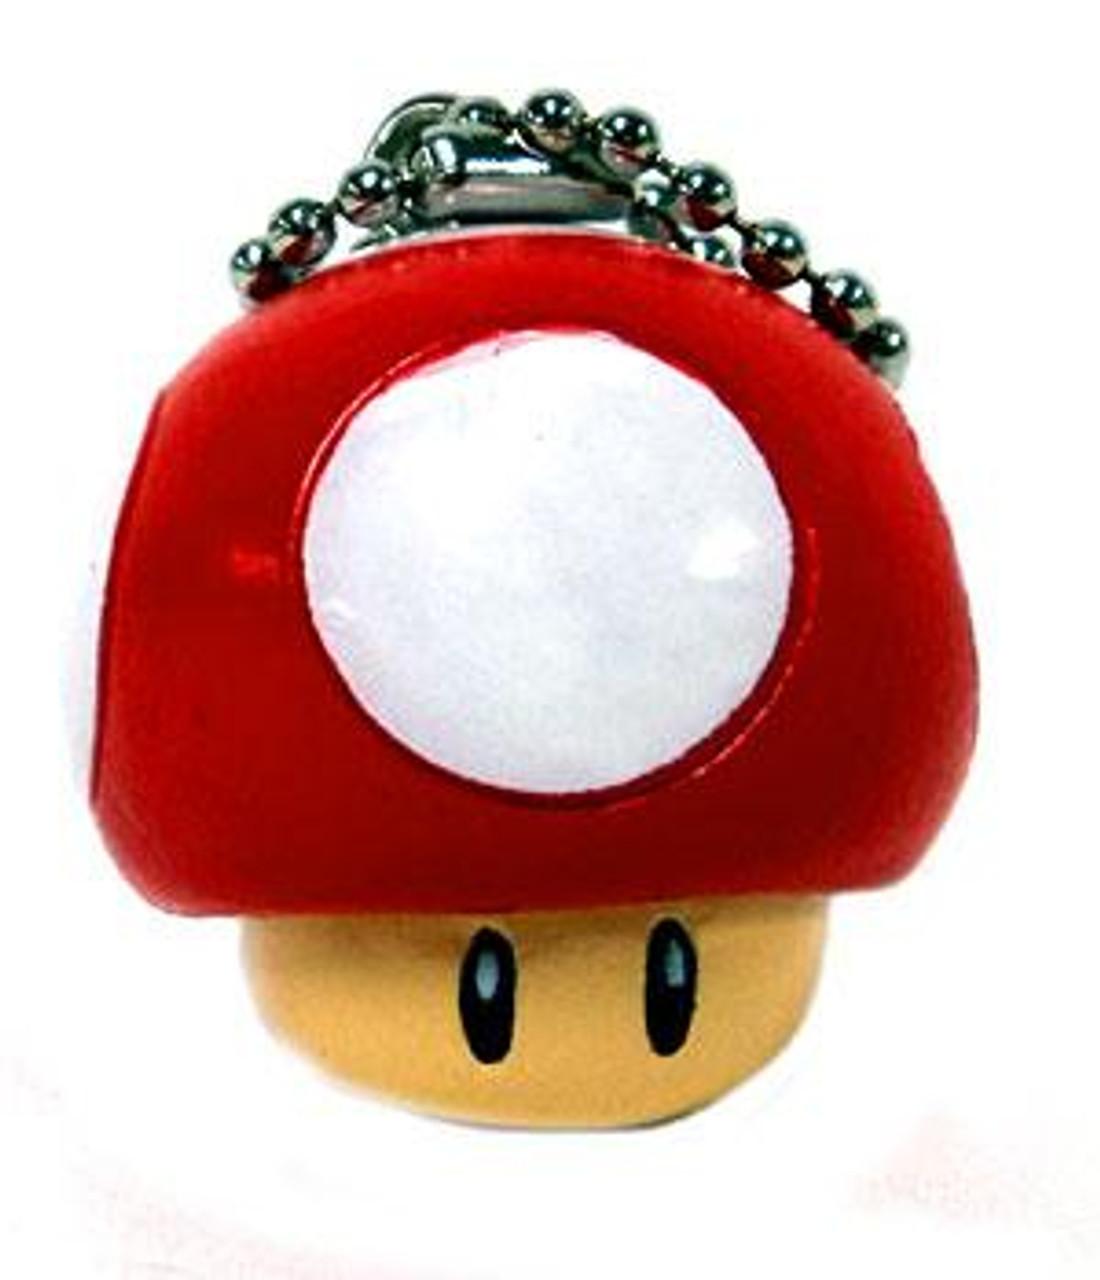 Super Mario Mario Kart DS Super Mushroom Keychain